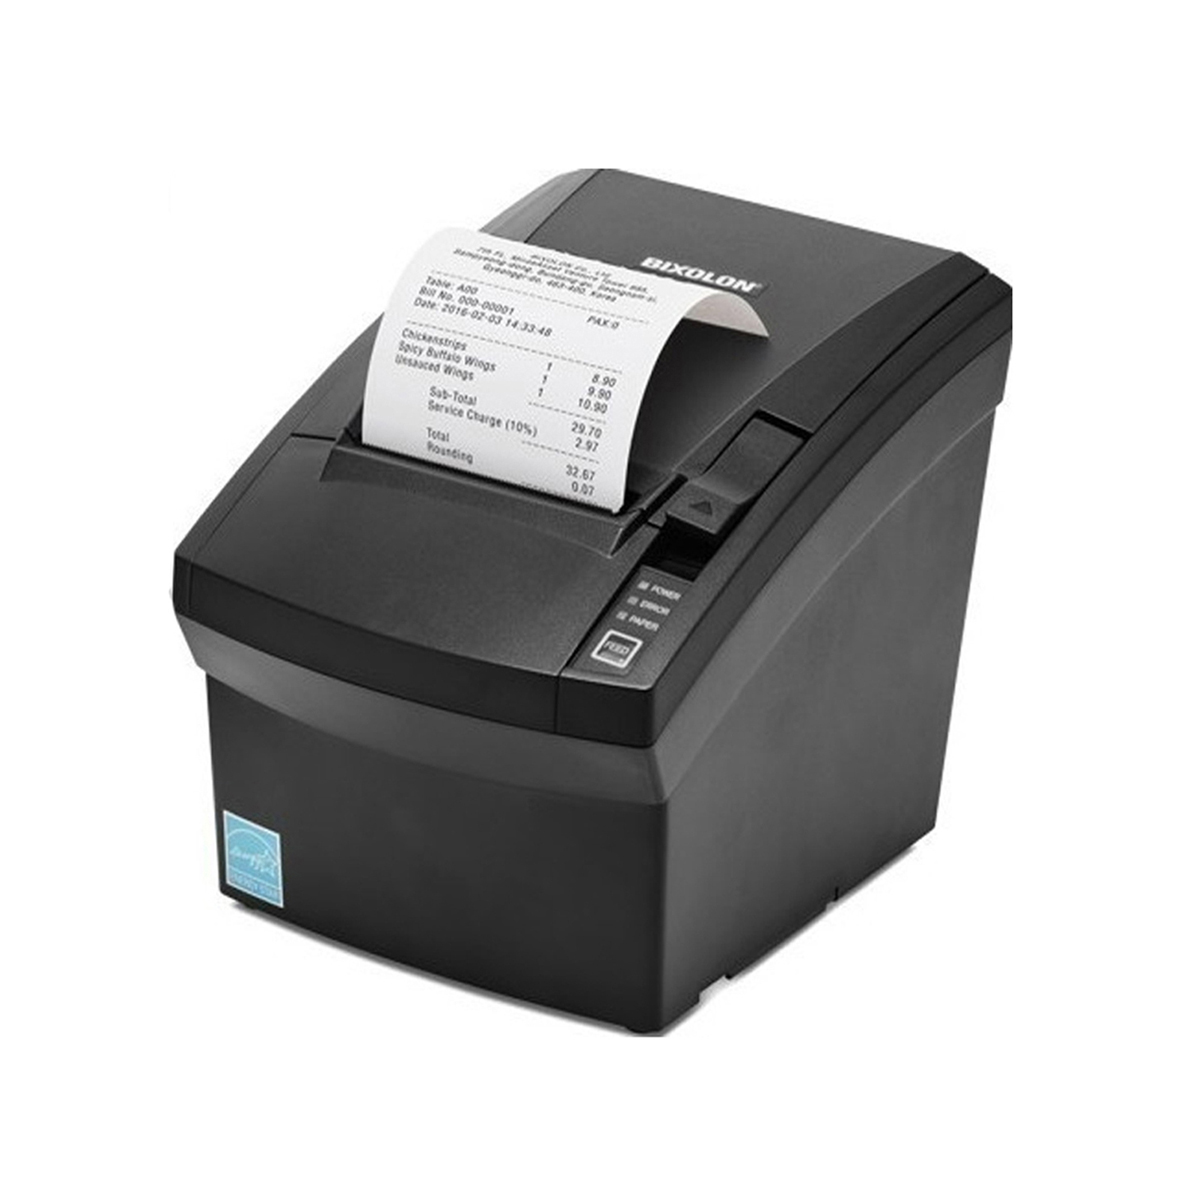 Thermal-Printer-BIXOLON-SRP330II-13